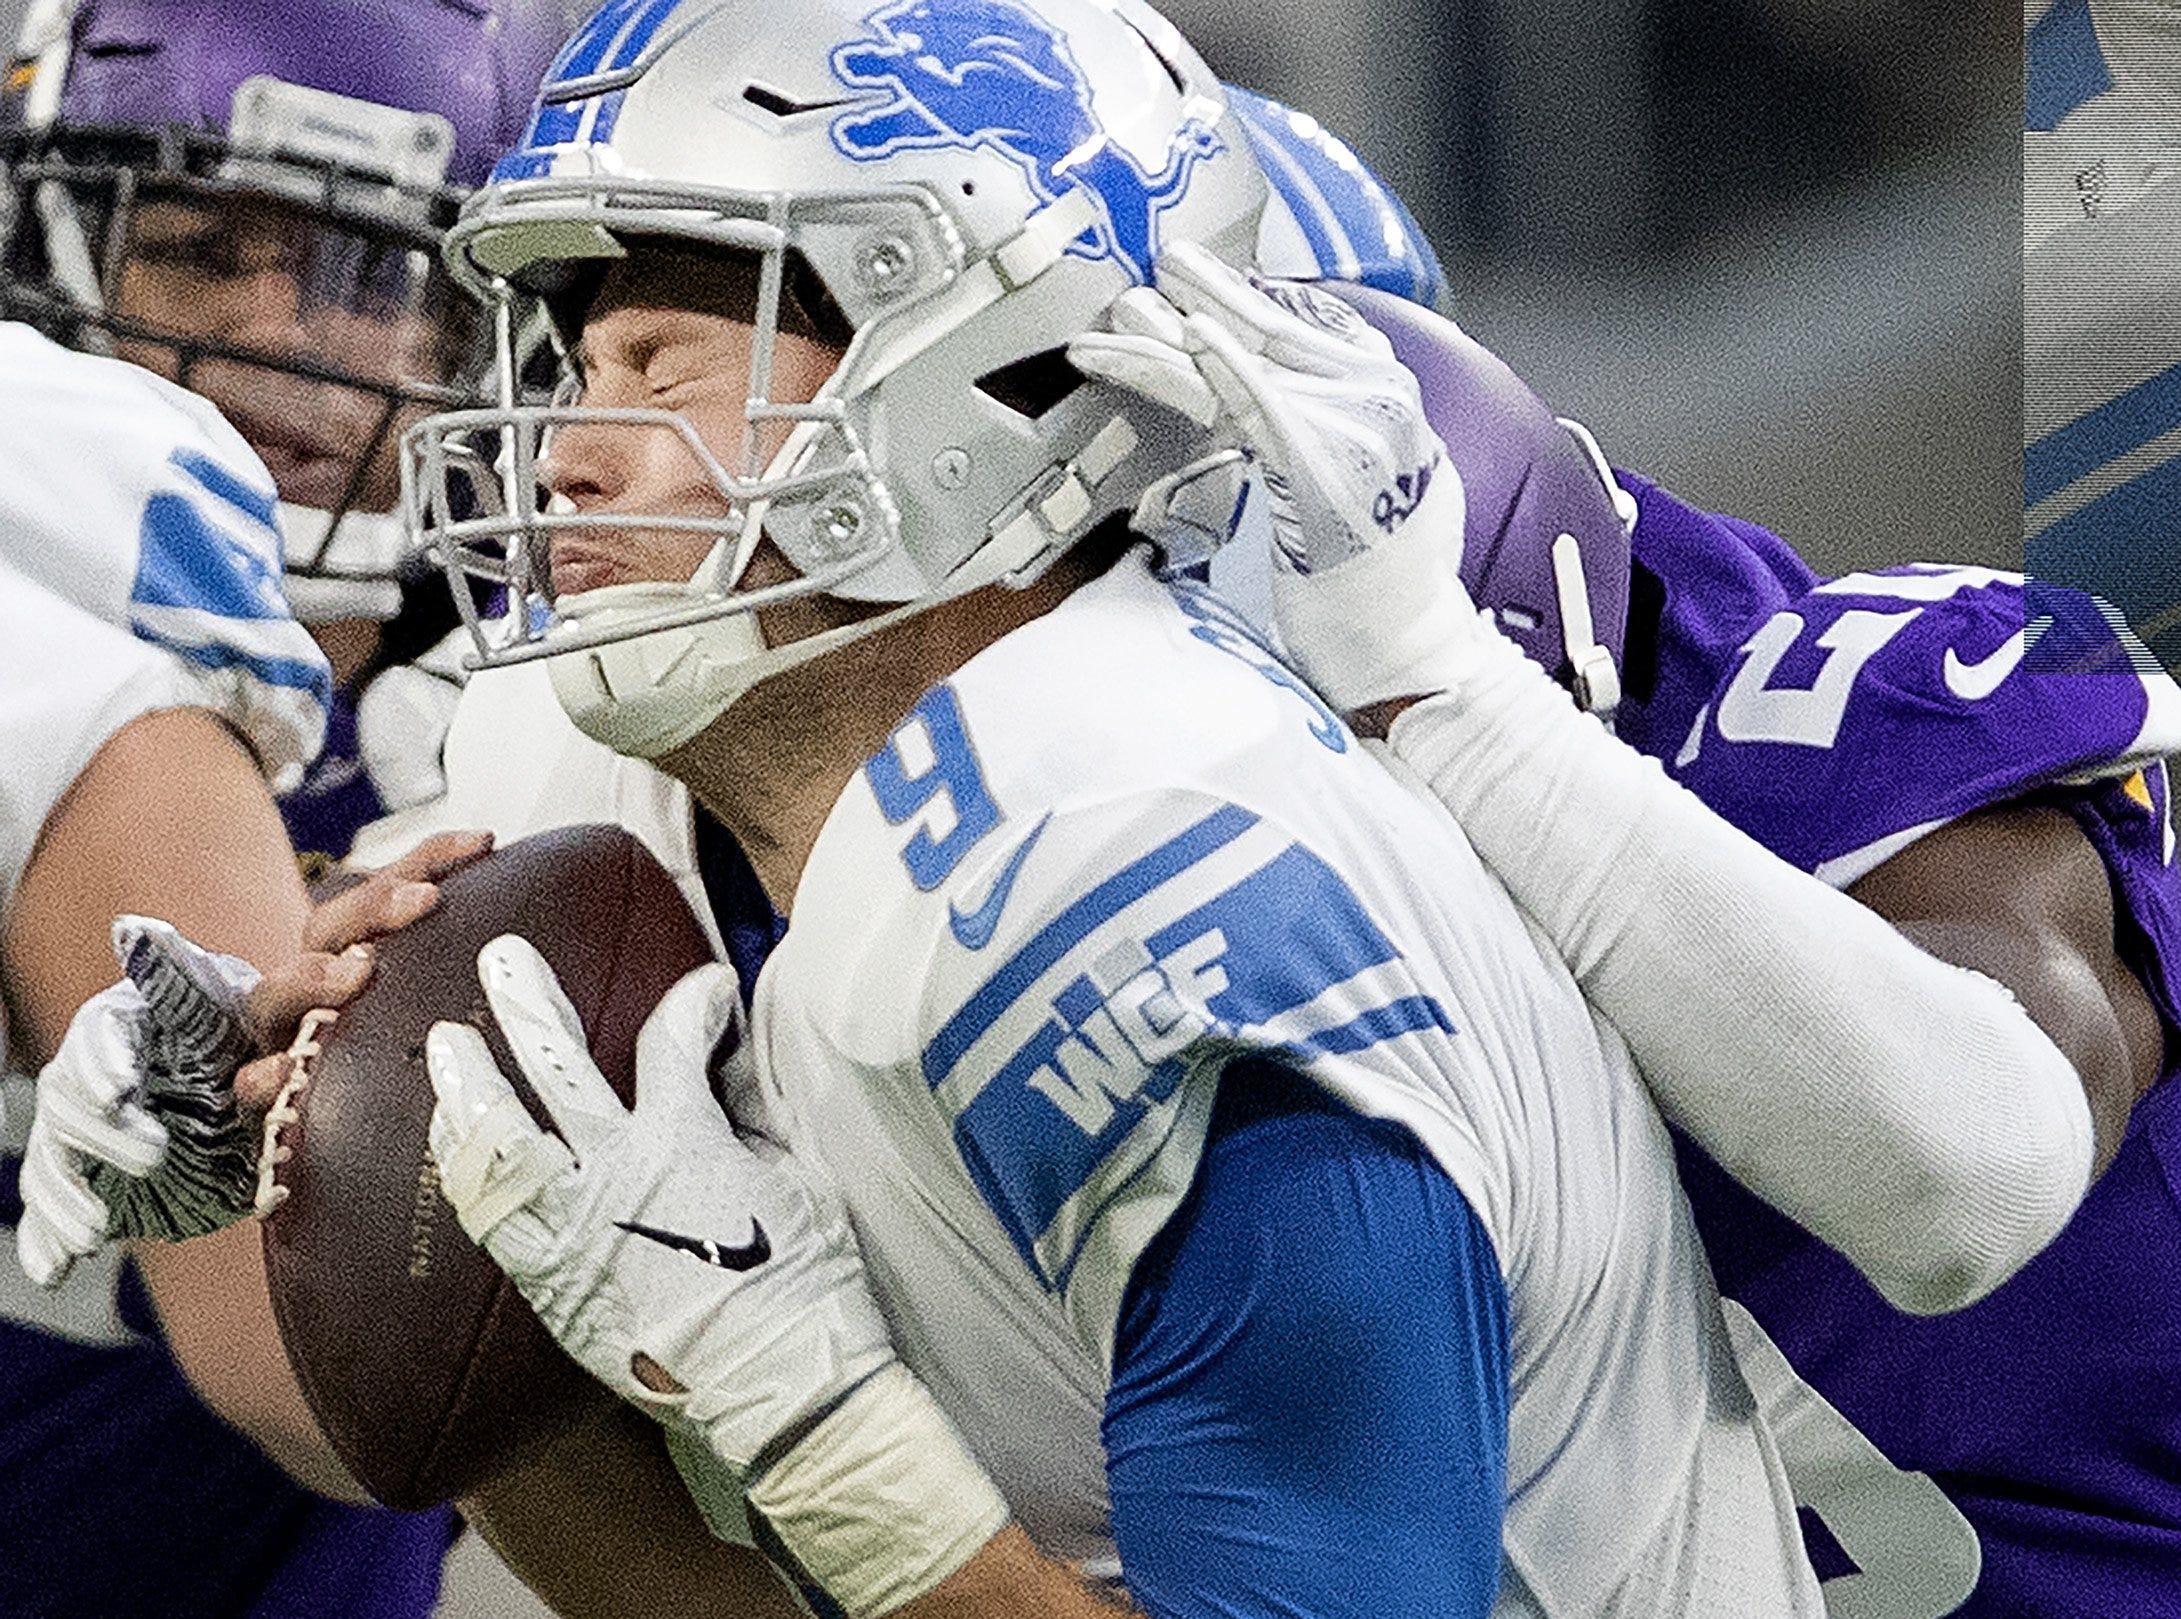 The Vikings' MacKensie Alexander sacks Lions quarterback Matthew Stafford in the third quarter of the Lions' 24-9 loss on Sunday, Nov. 4, 2018, in Minneapolis.